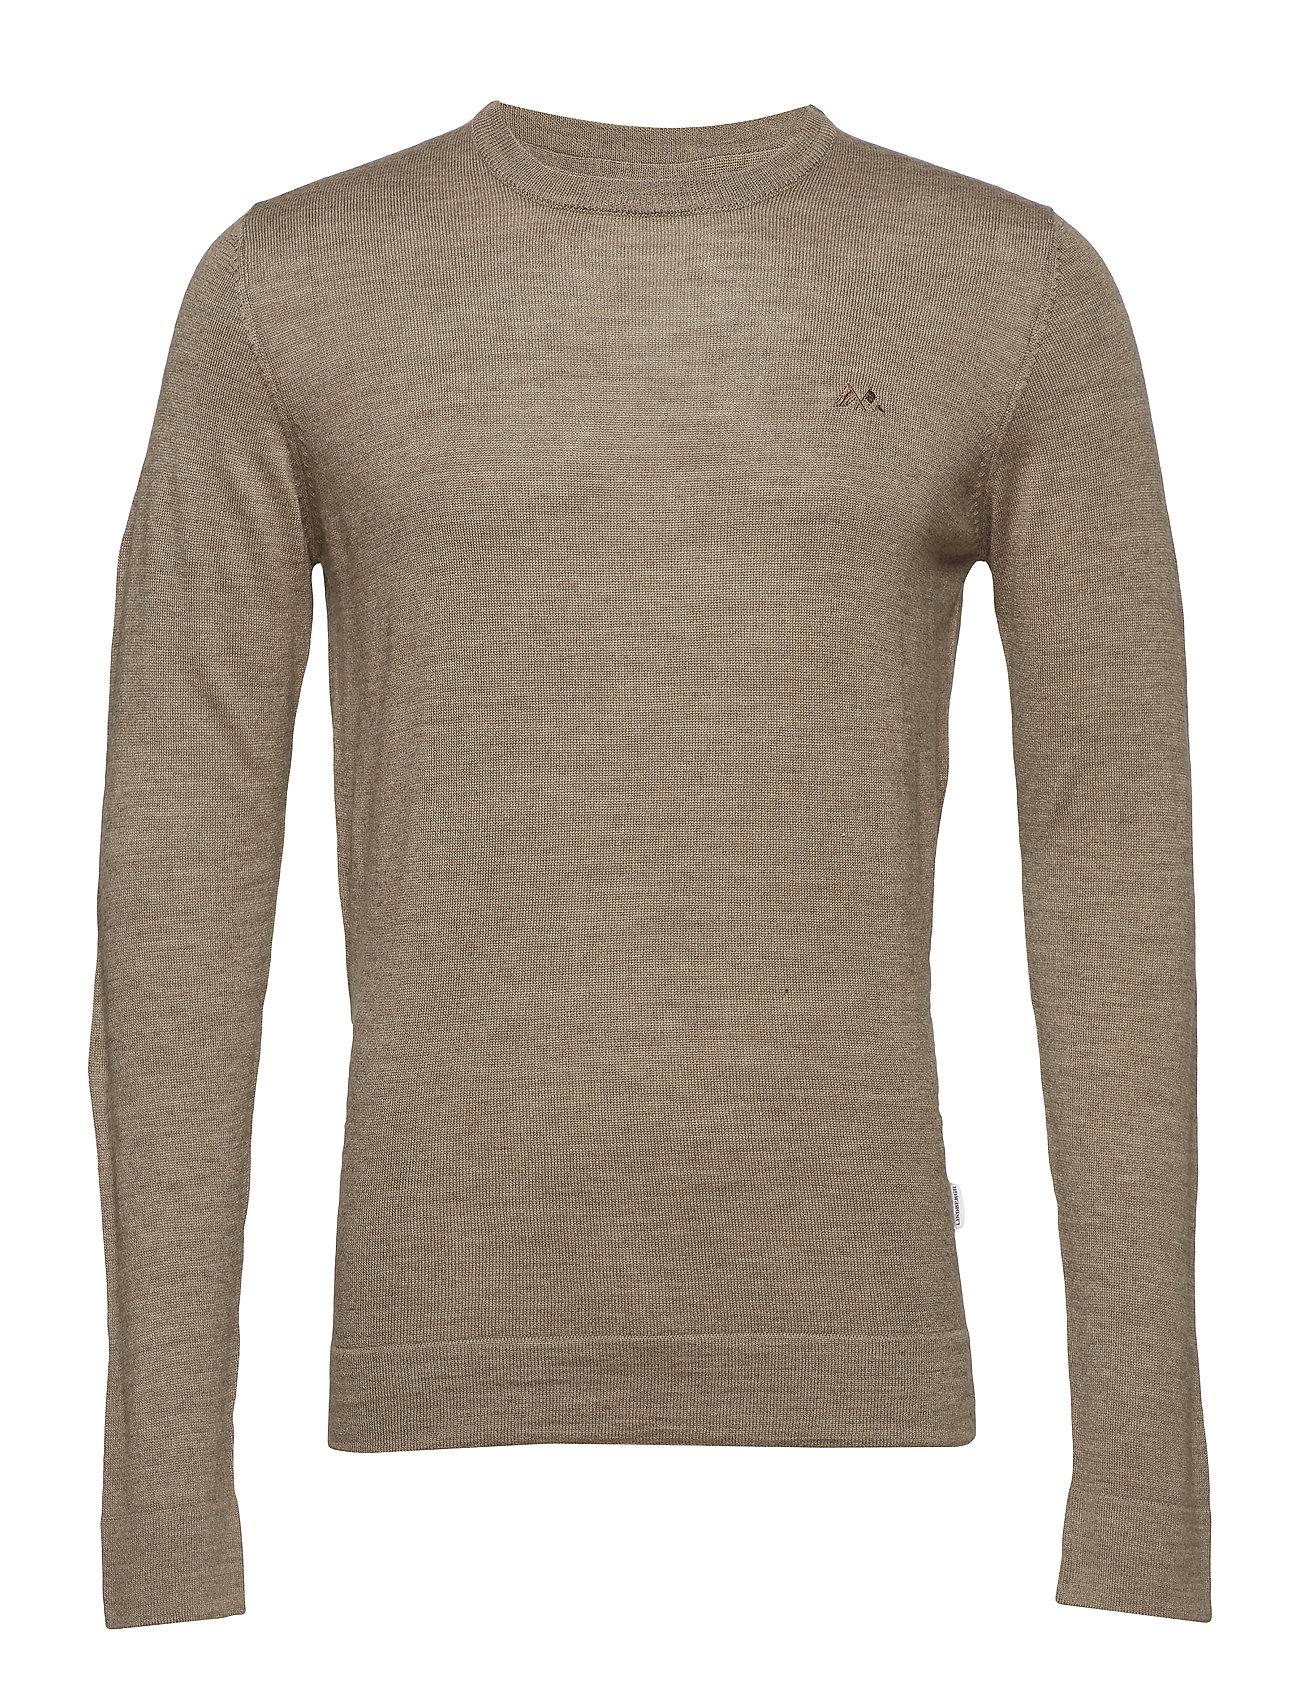 Lindbergh Merino knit o-neck - DK SAND